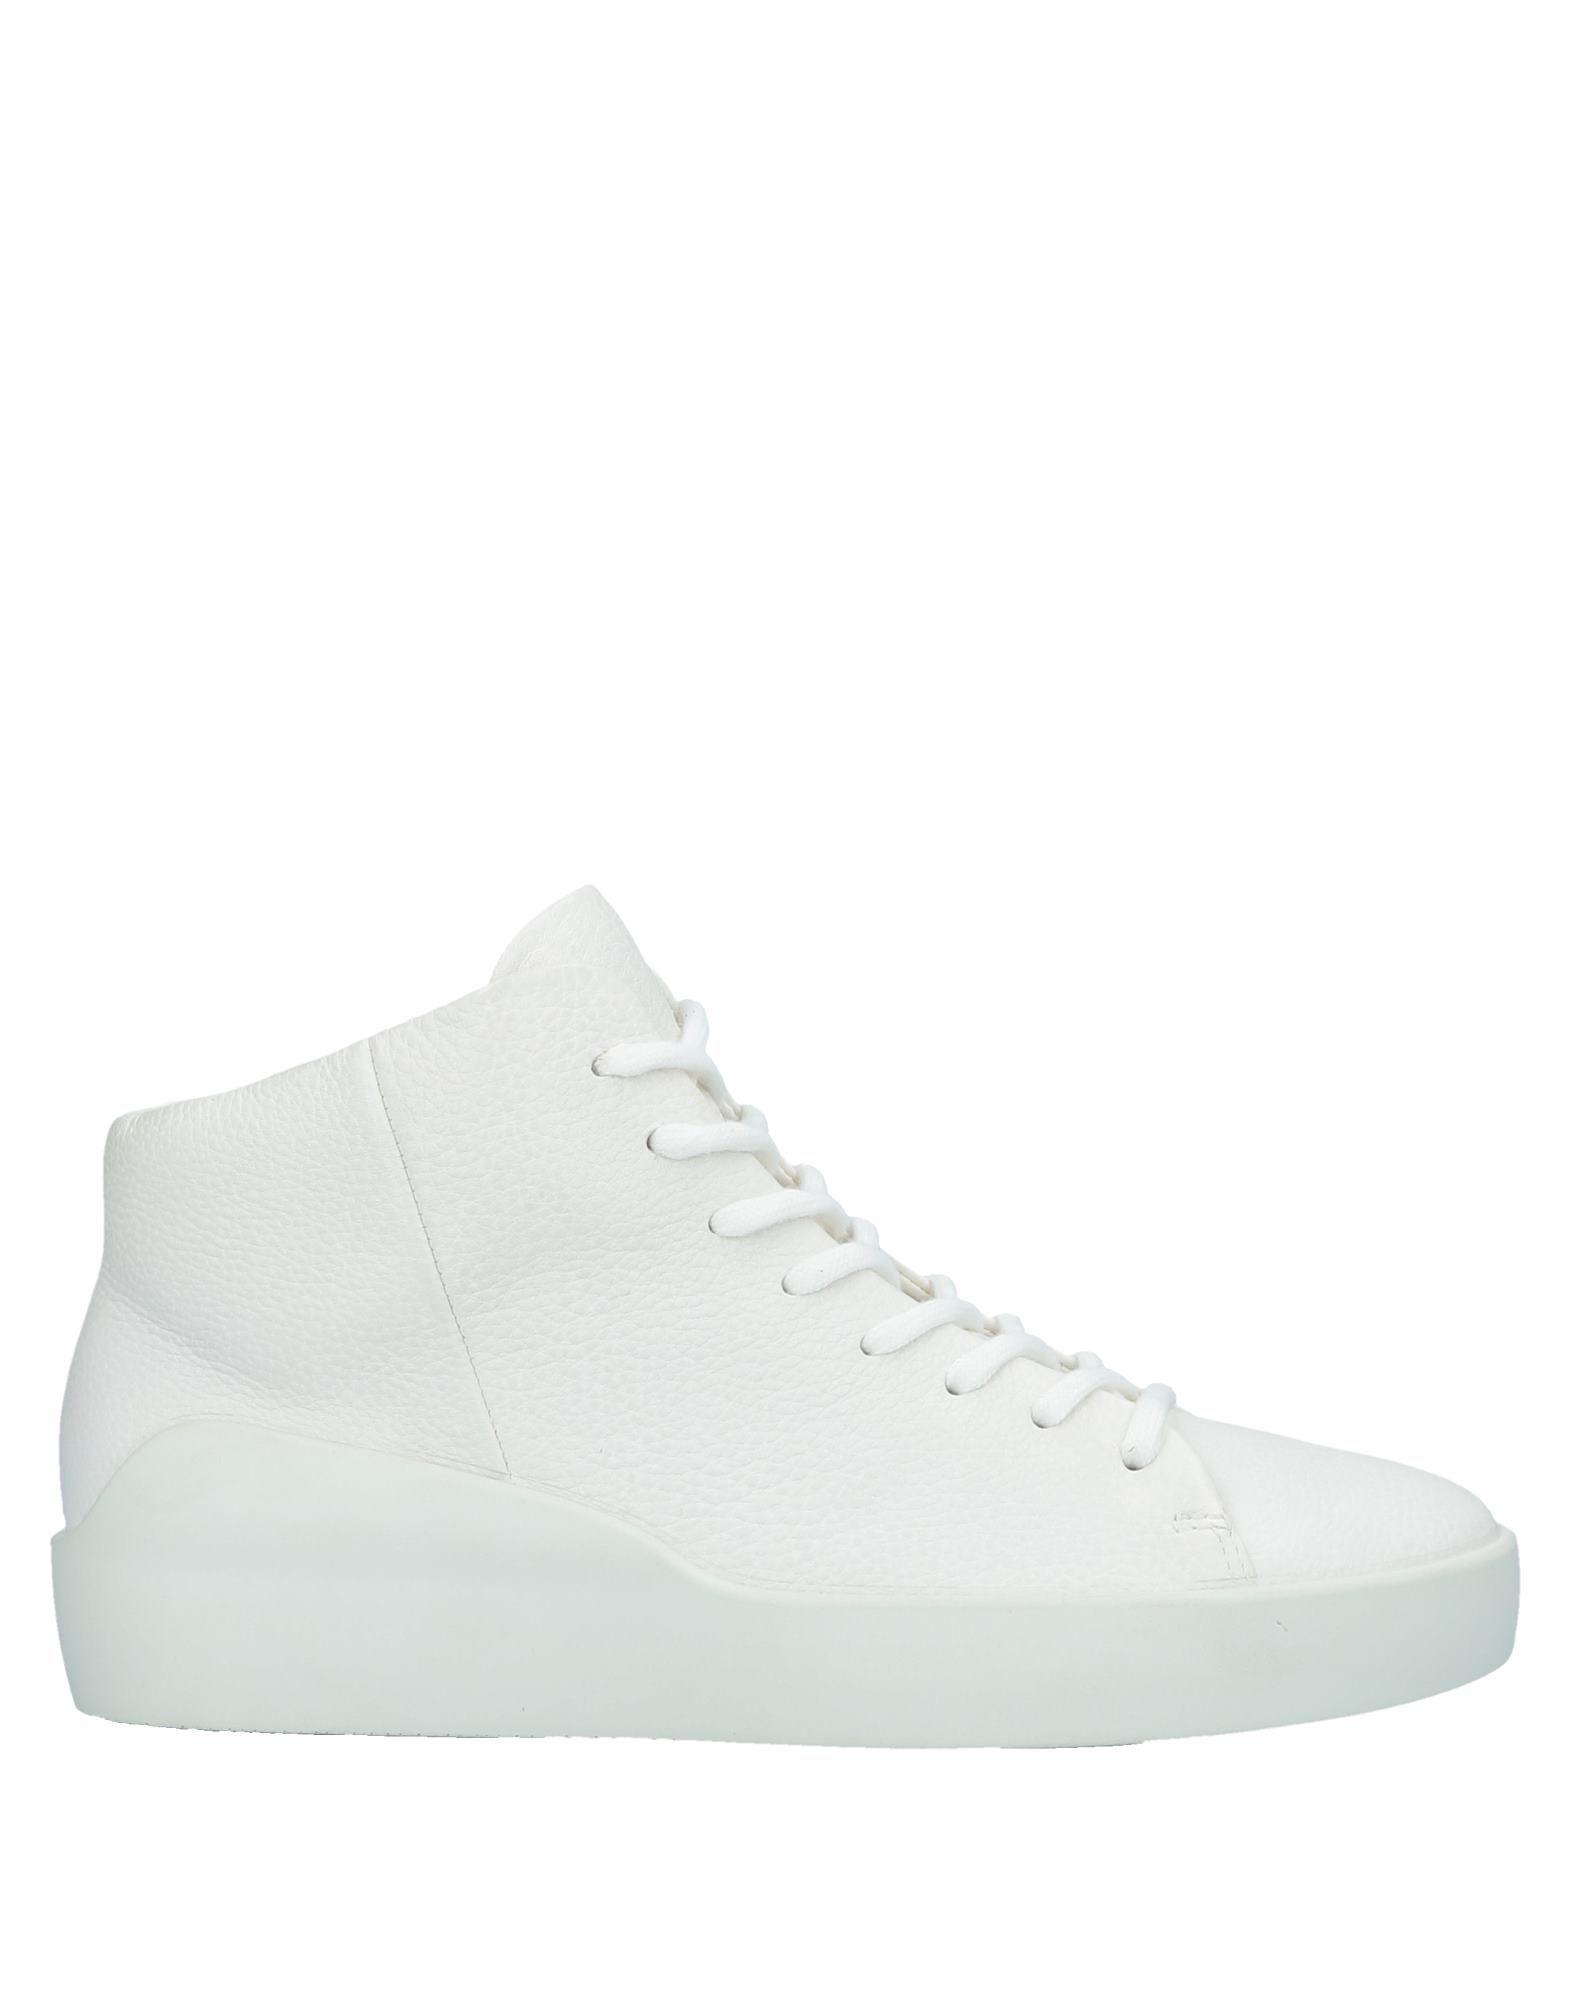 Ecco X The Last Conspiracy Sneakers Damen  11536868LH Heiße Schuhe